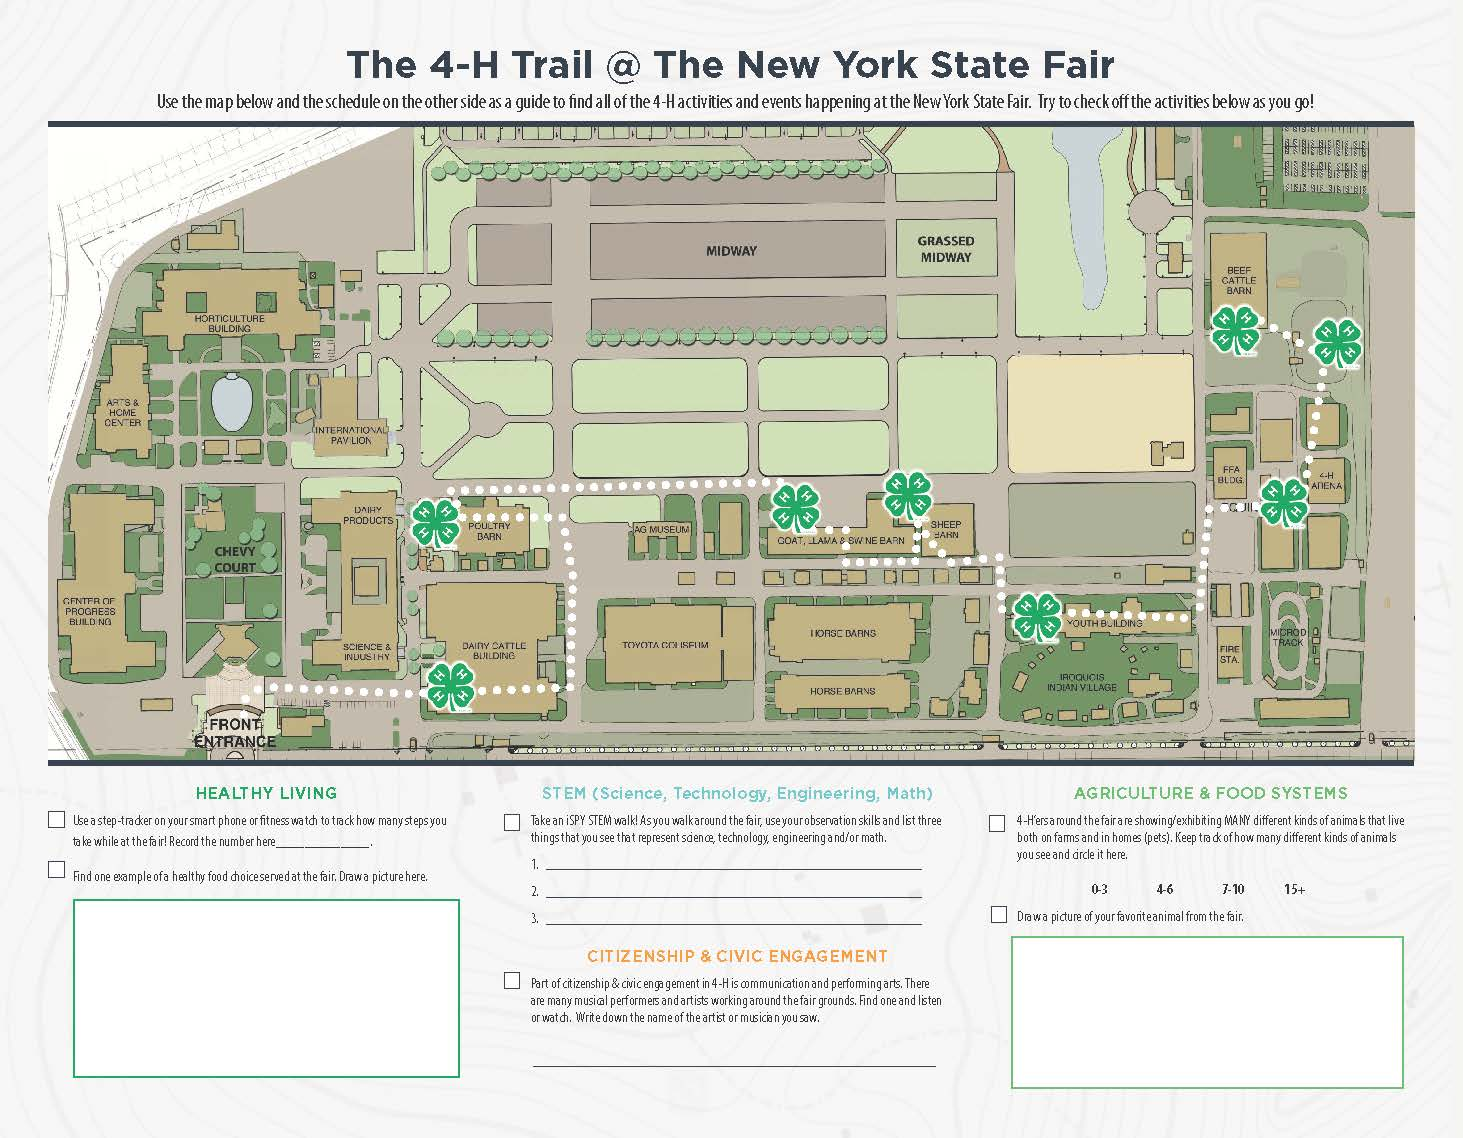 4-H Trail Brochure_Page_1.jpg